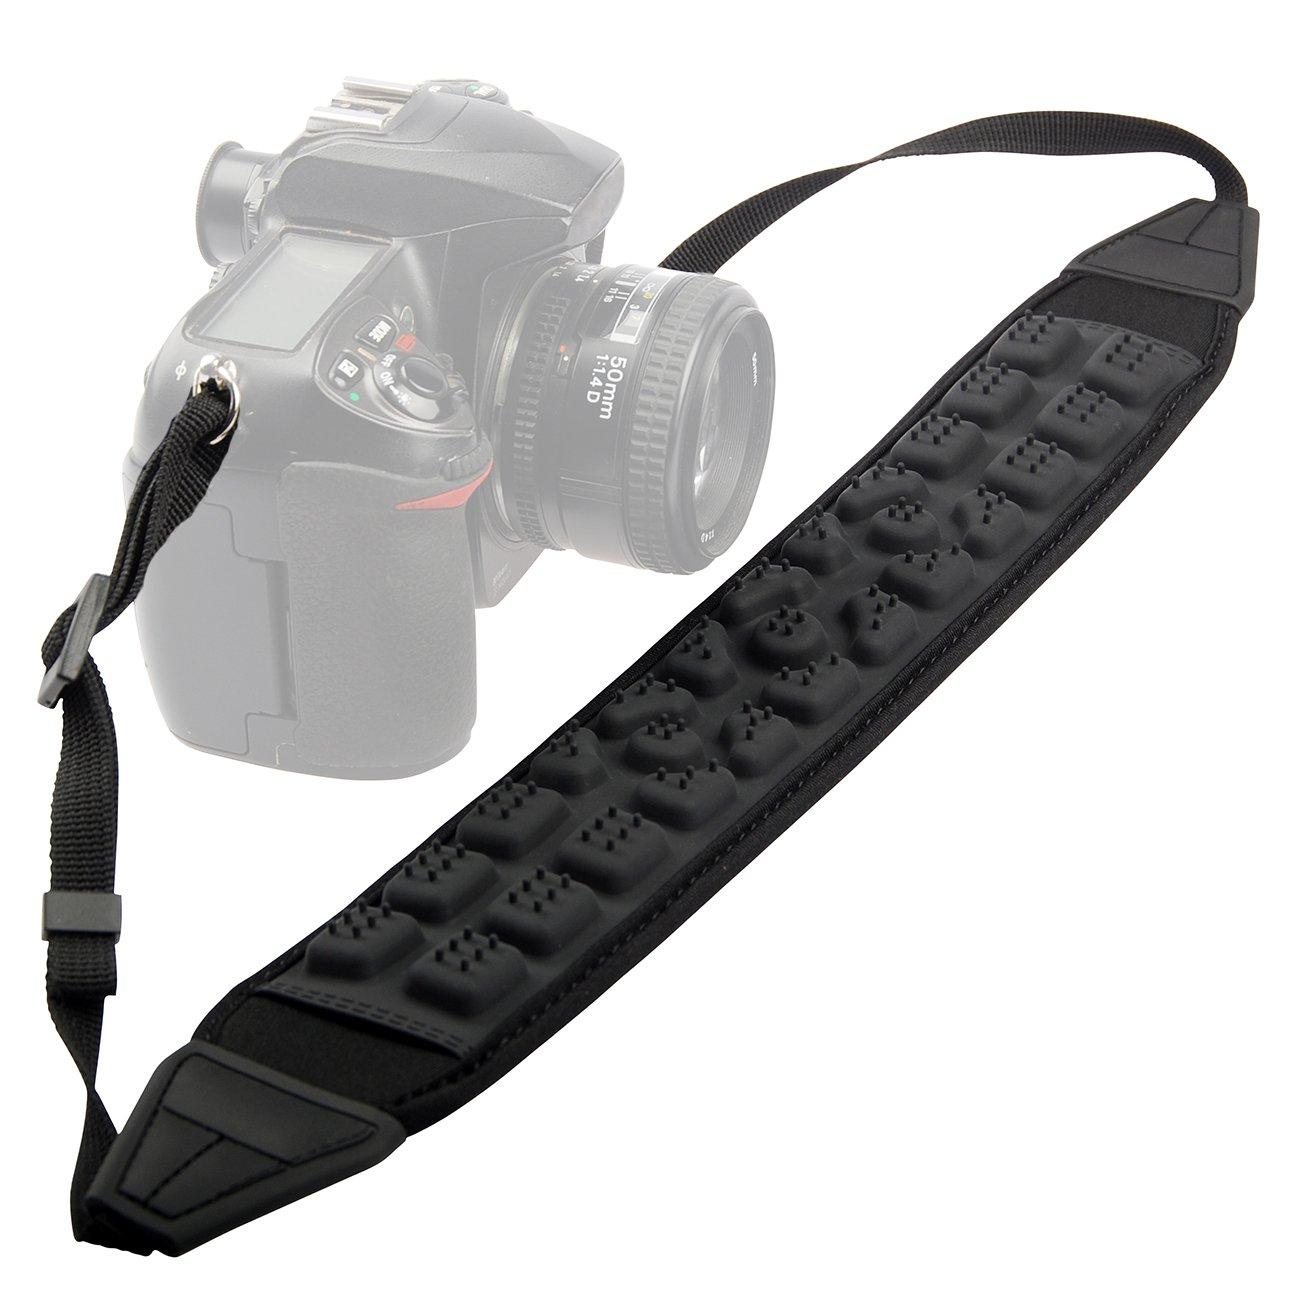 TARION LY-105 Pressure Reduction Decompression Massage Camera Shoulder Neck Strap for SLR DSLR Mirrorless Digital Camera Nikon Canon Sony Pentax